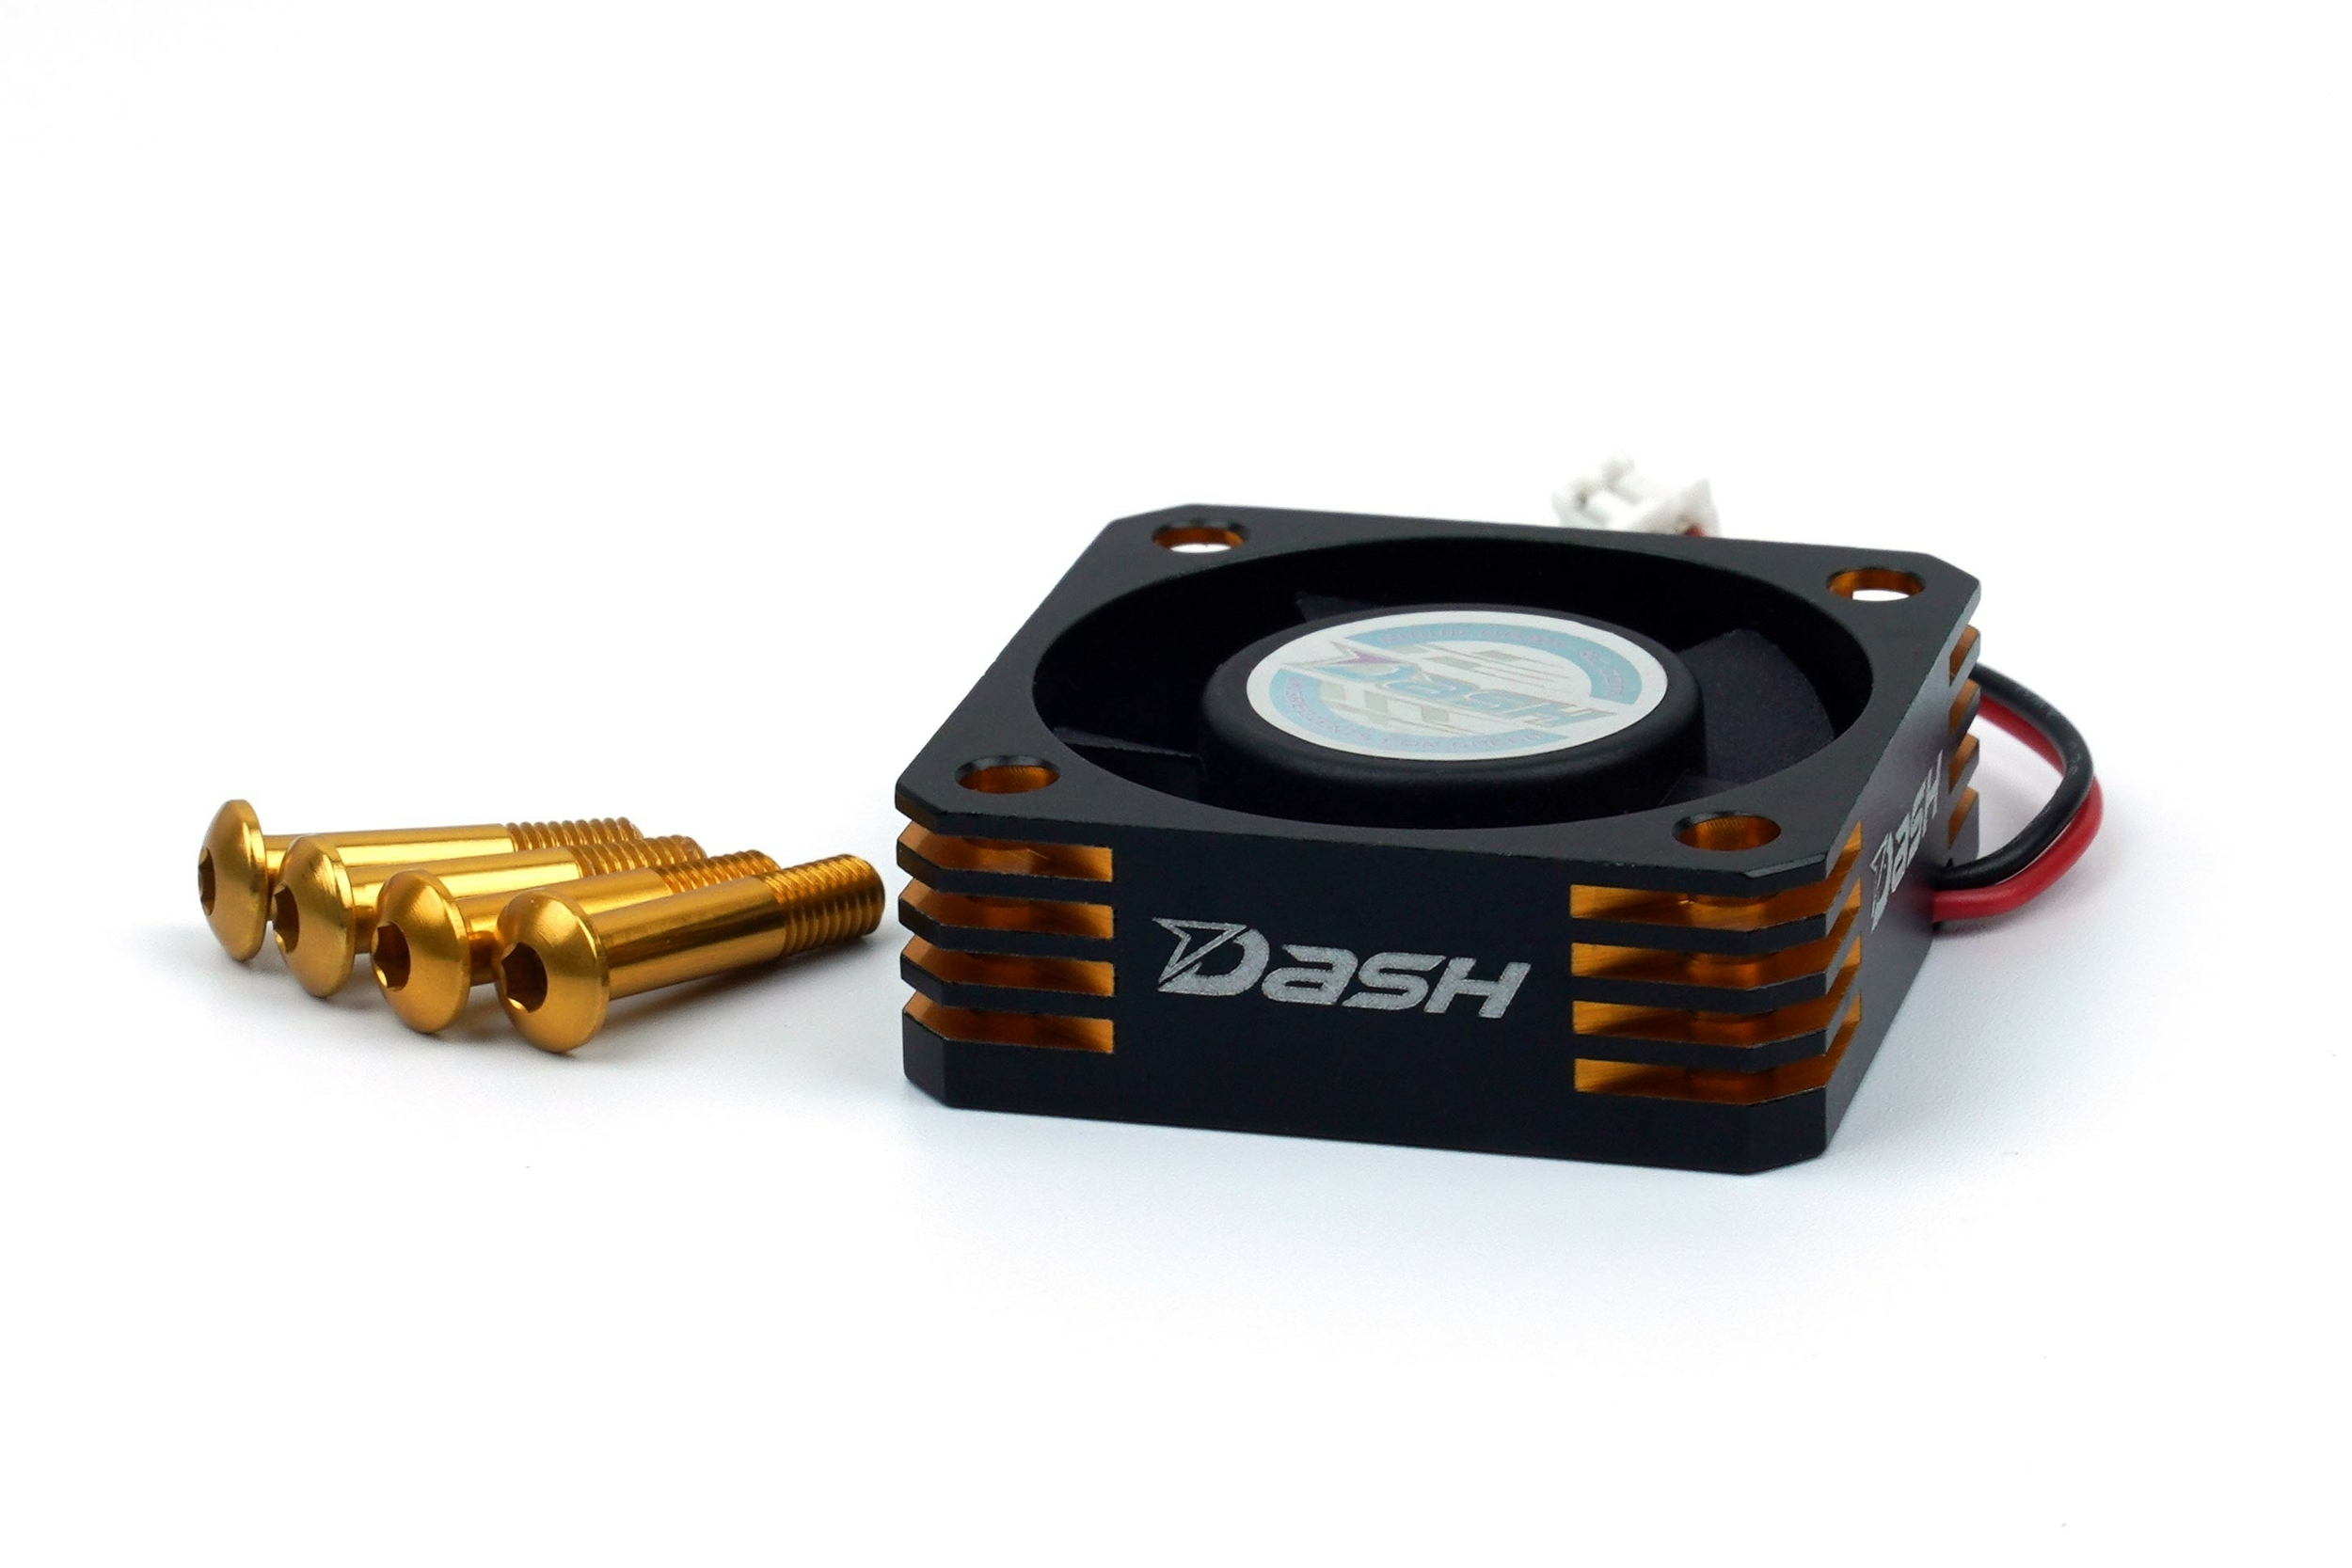 DASH VENTILATEUR VARIATEUR 30X30X10 ALU BLACK GOLDEN, DA-770107